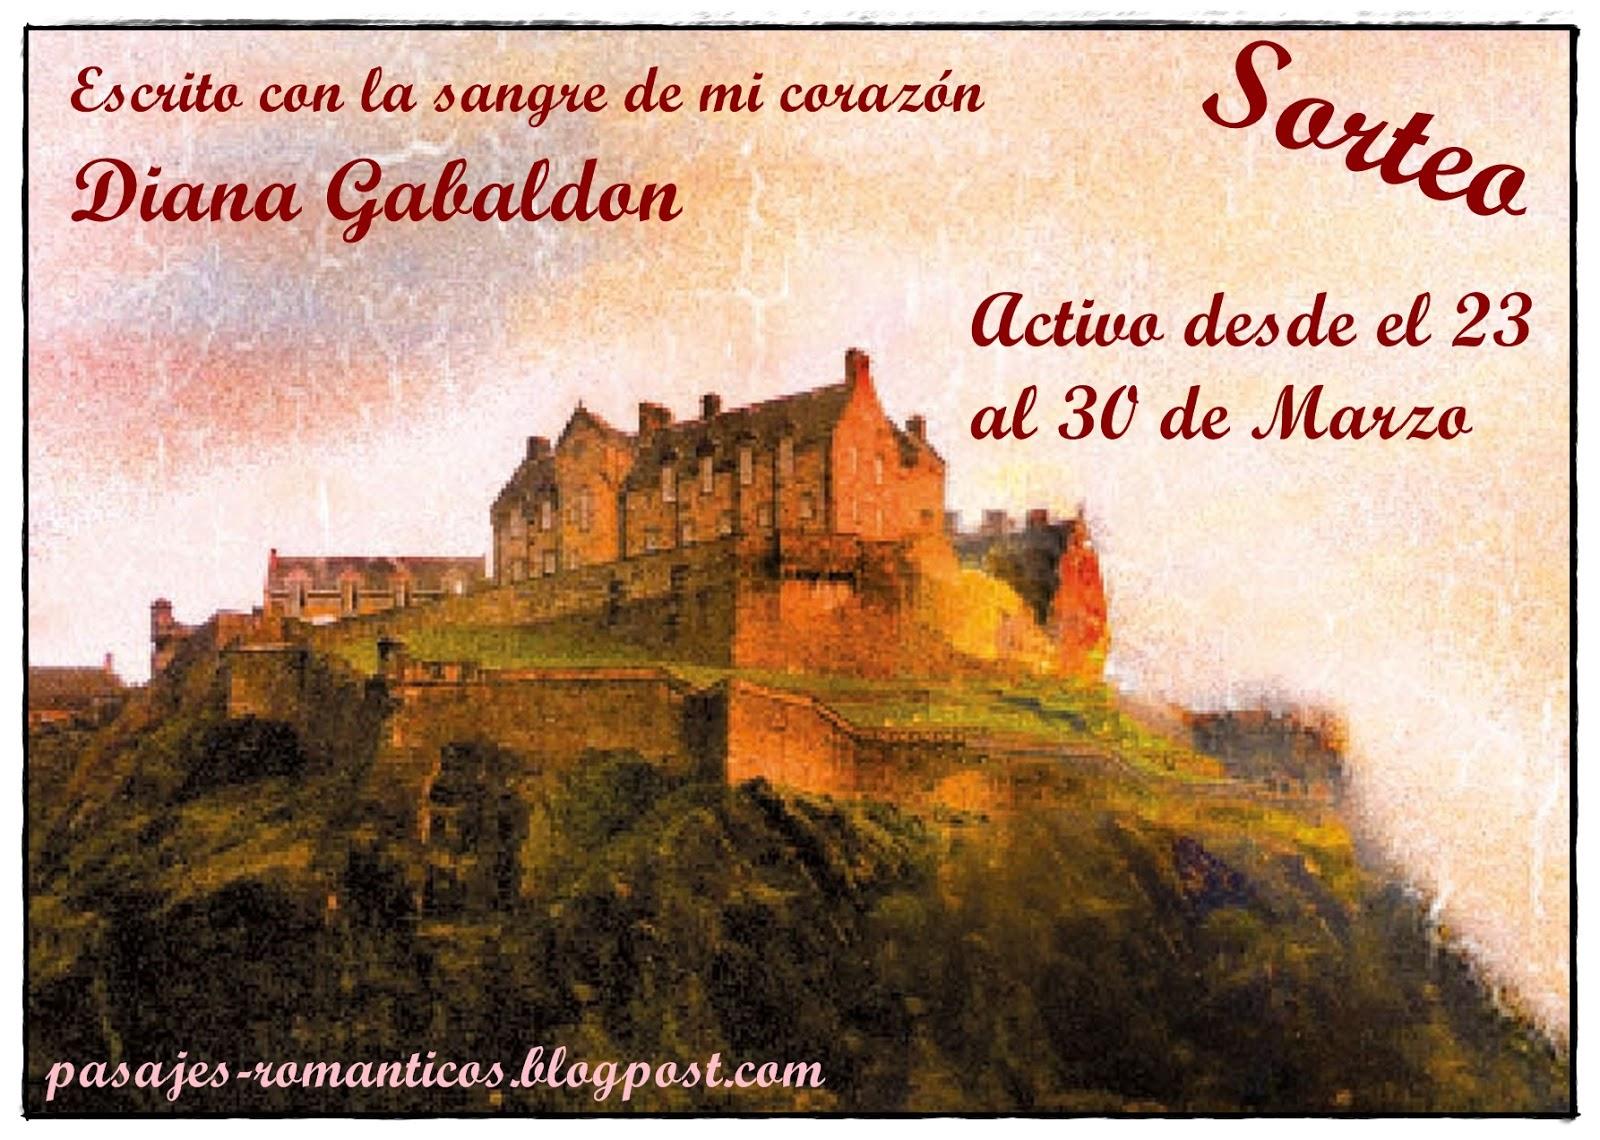 Sorteo: Diana Gabaldon